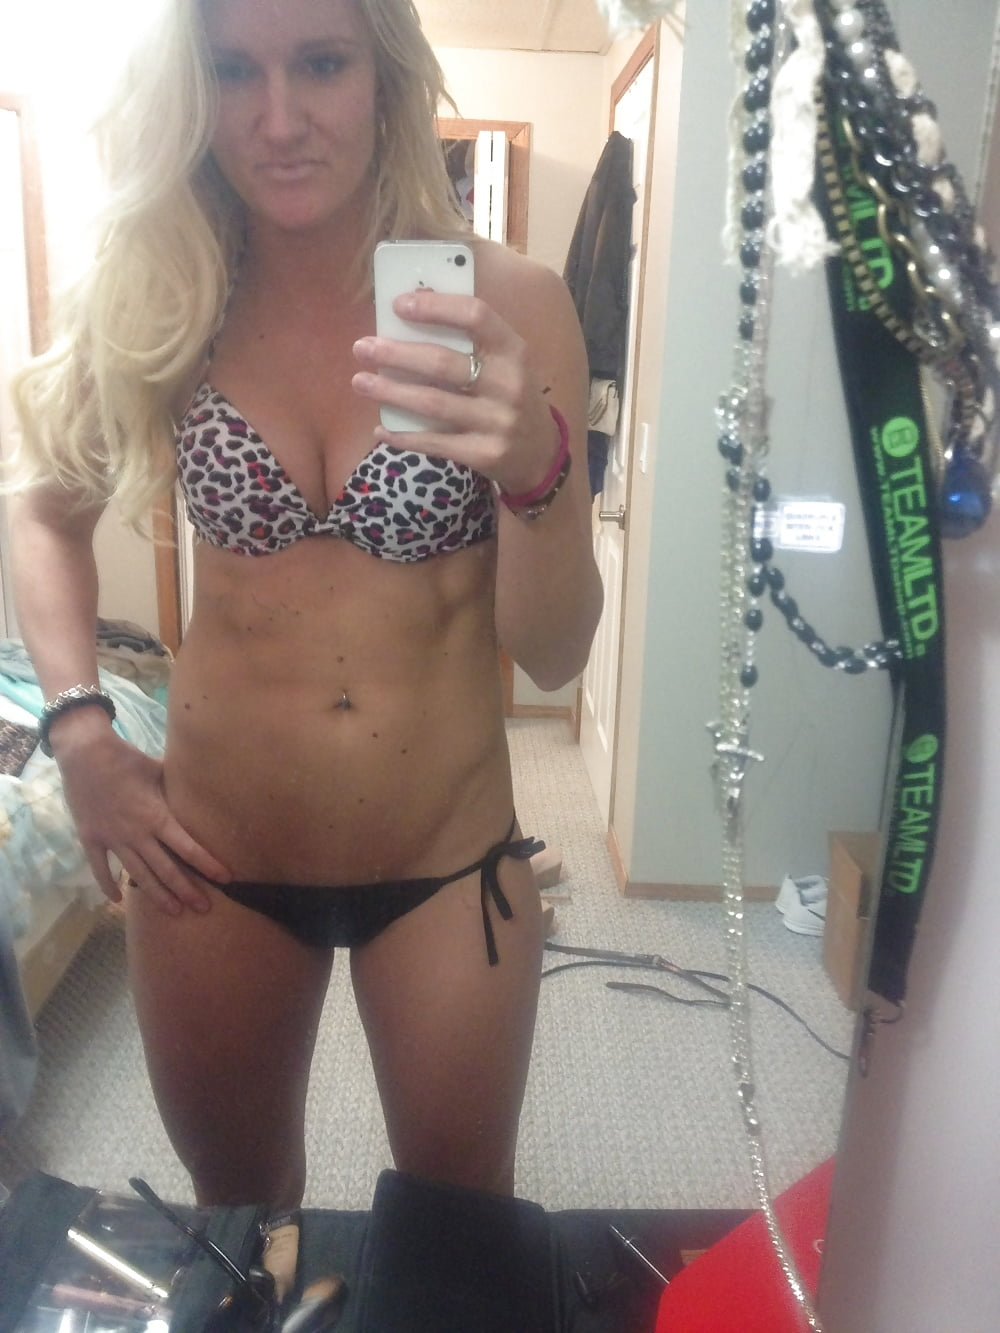 Pussy Kaylyn Kyle naked (98 photos), Tits, Hot, Feet, braless 2017